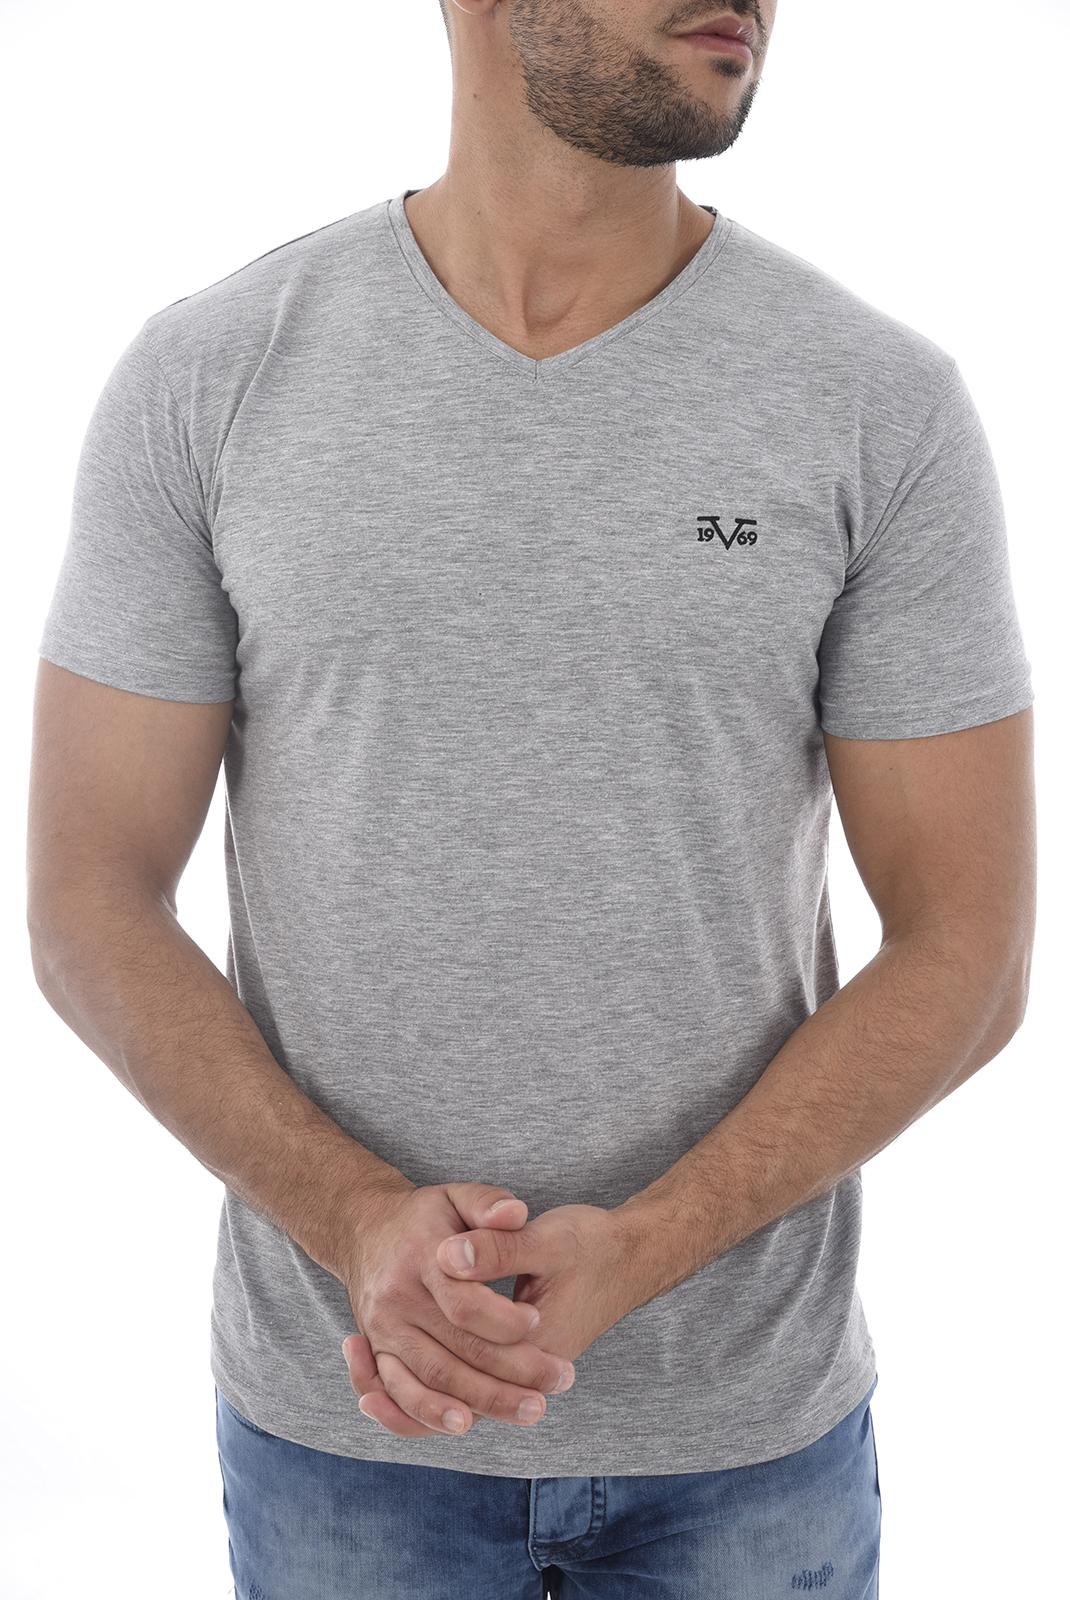 Tee-shirts  Versace 19.69 MODENE GRIS CLAIR